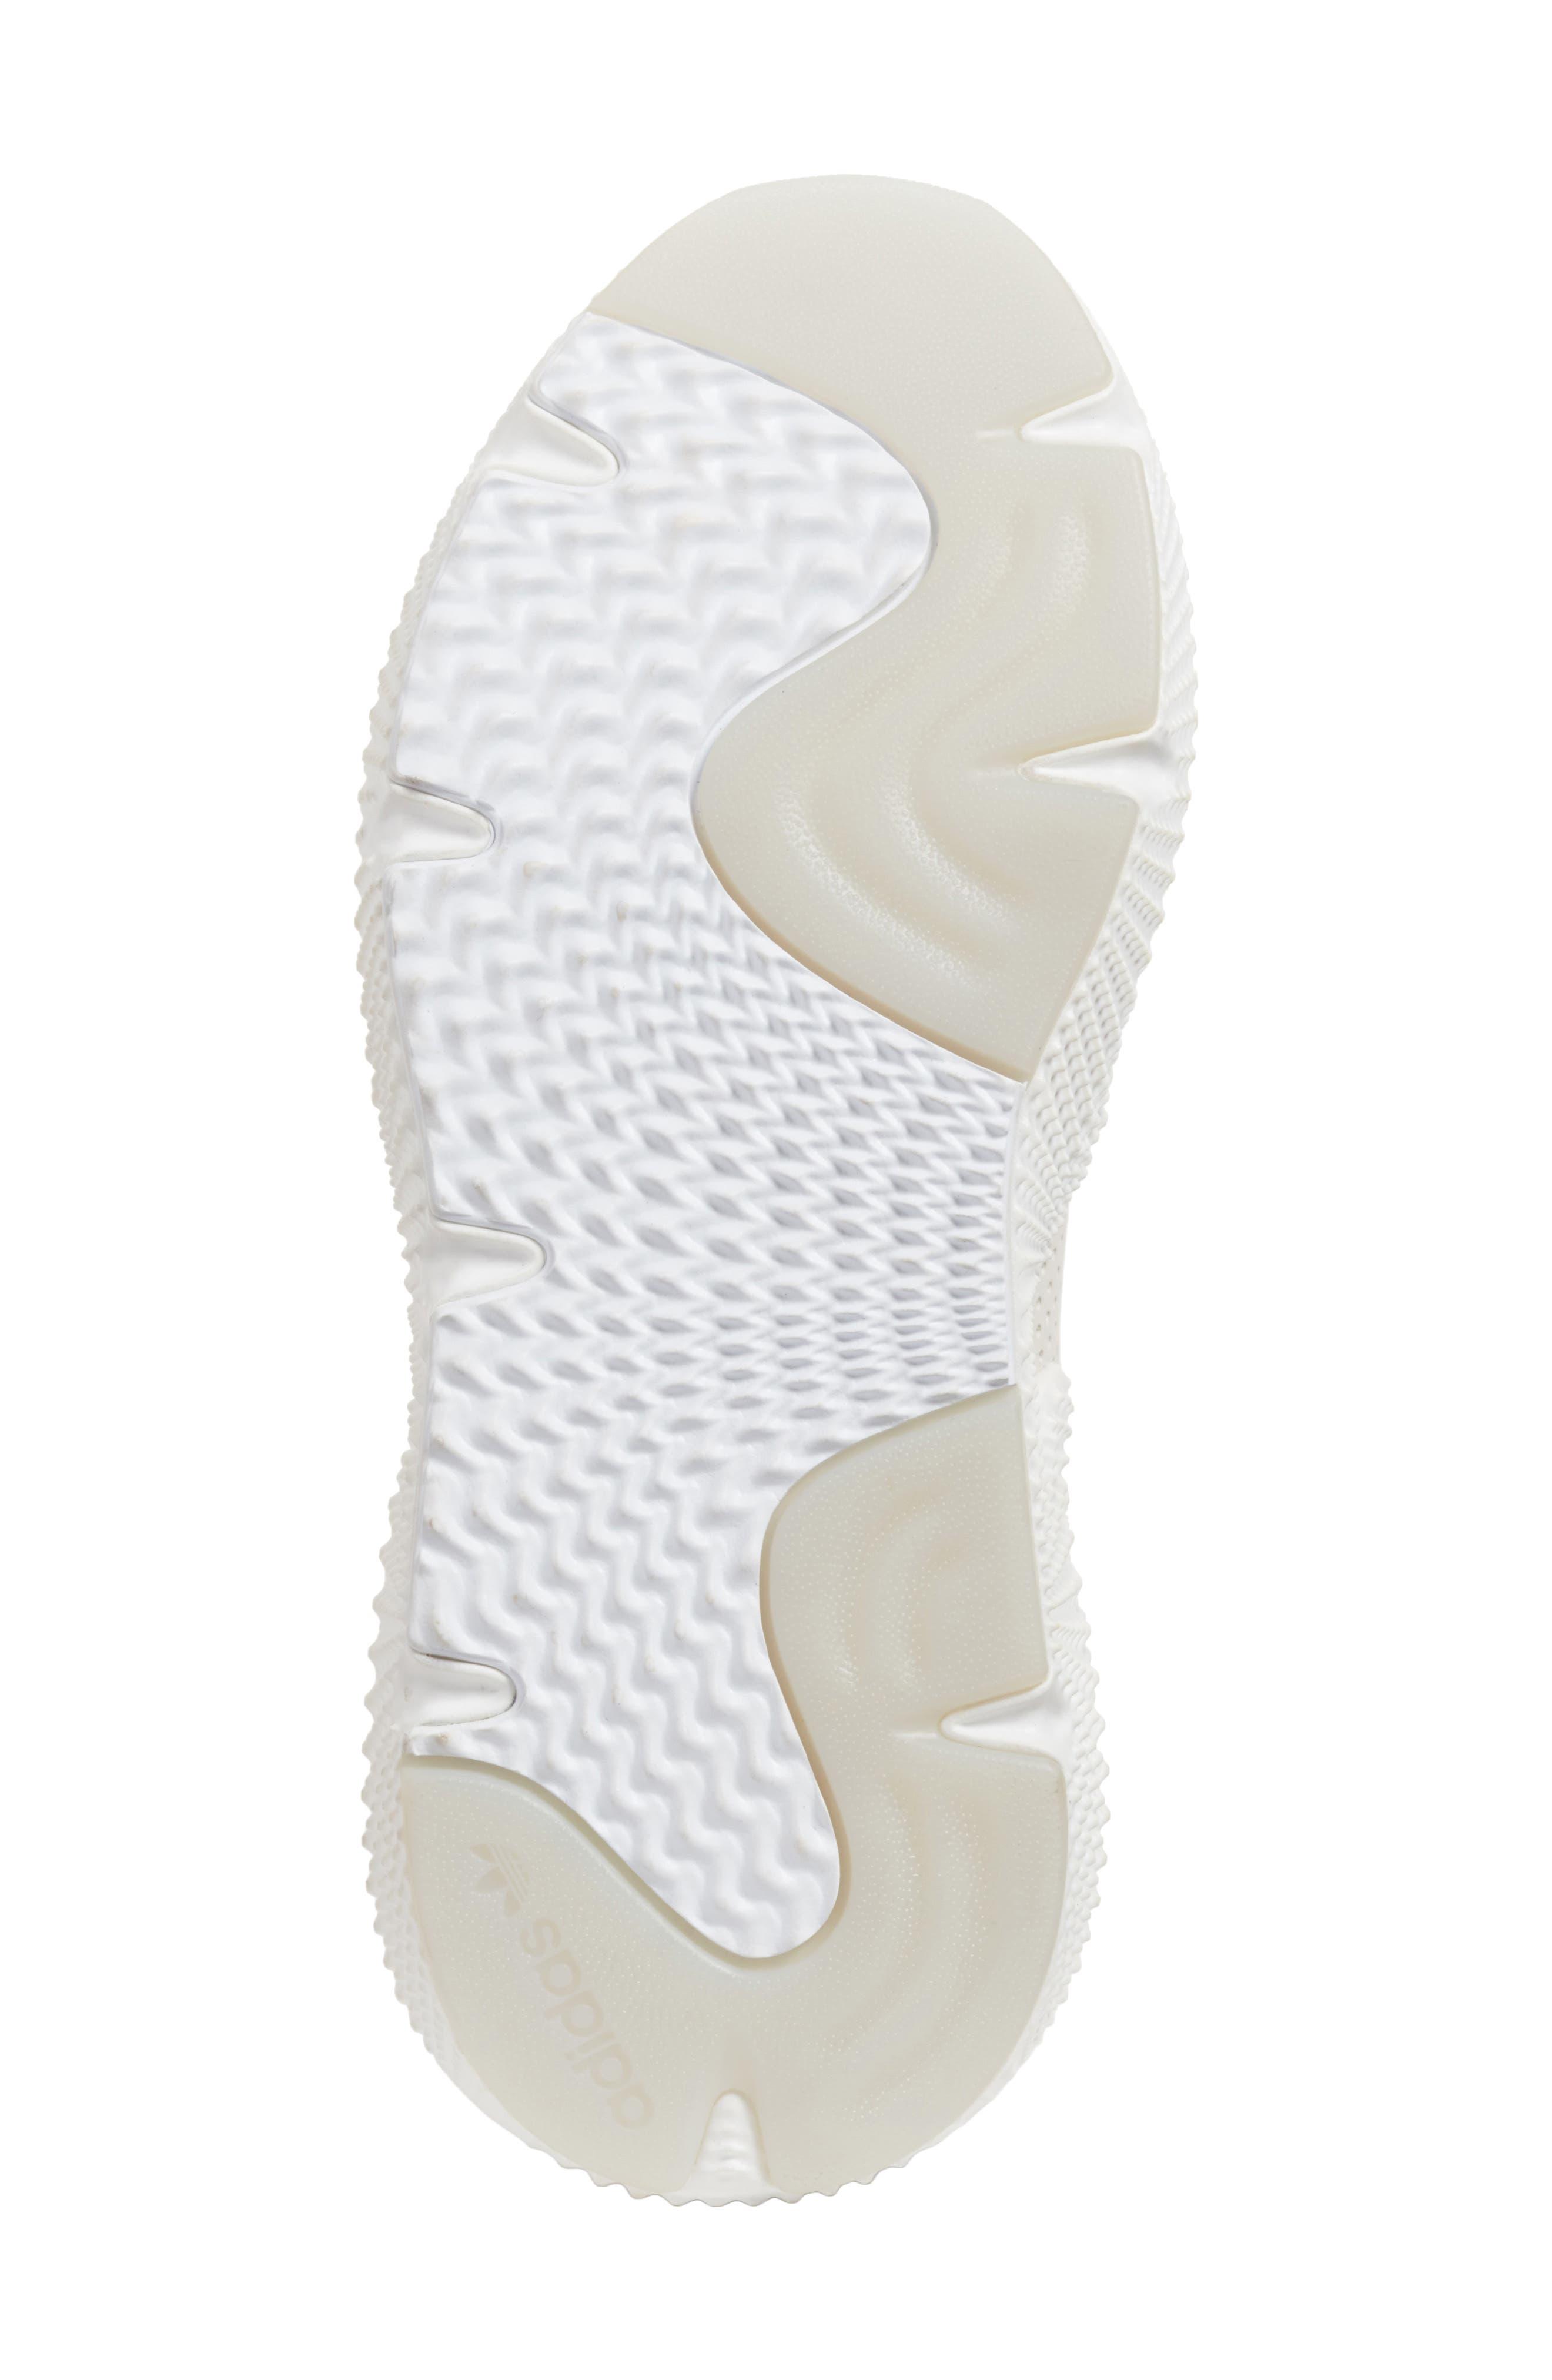 Prophere Sneaker,                             Alternate thumbnail 6, color,                             White/ White/ Supplier Colour